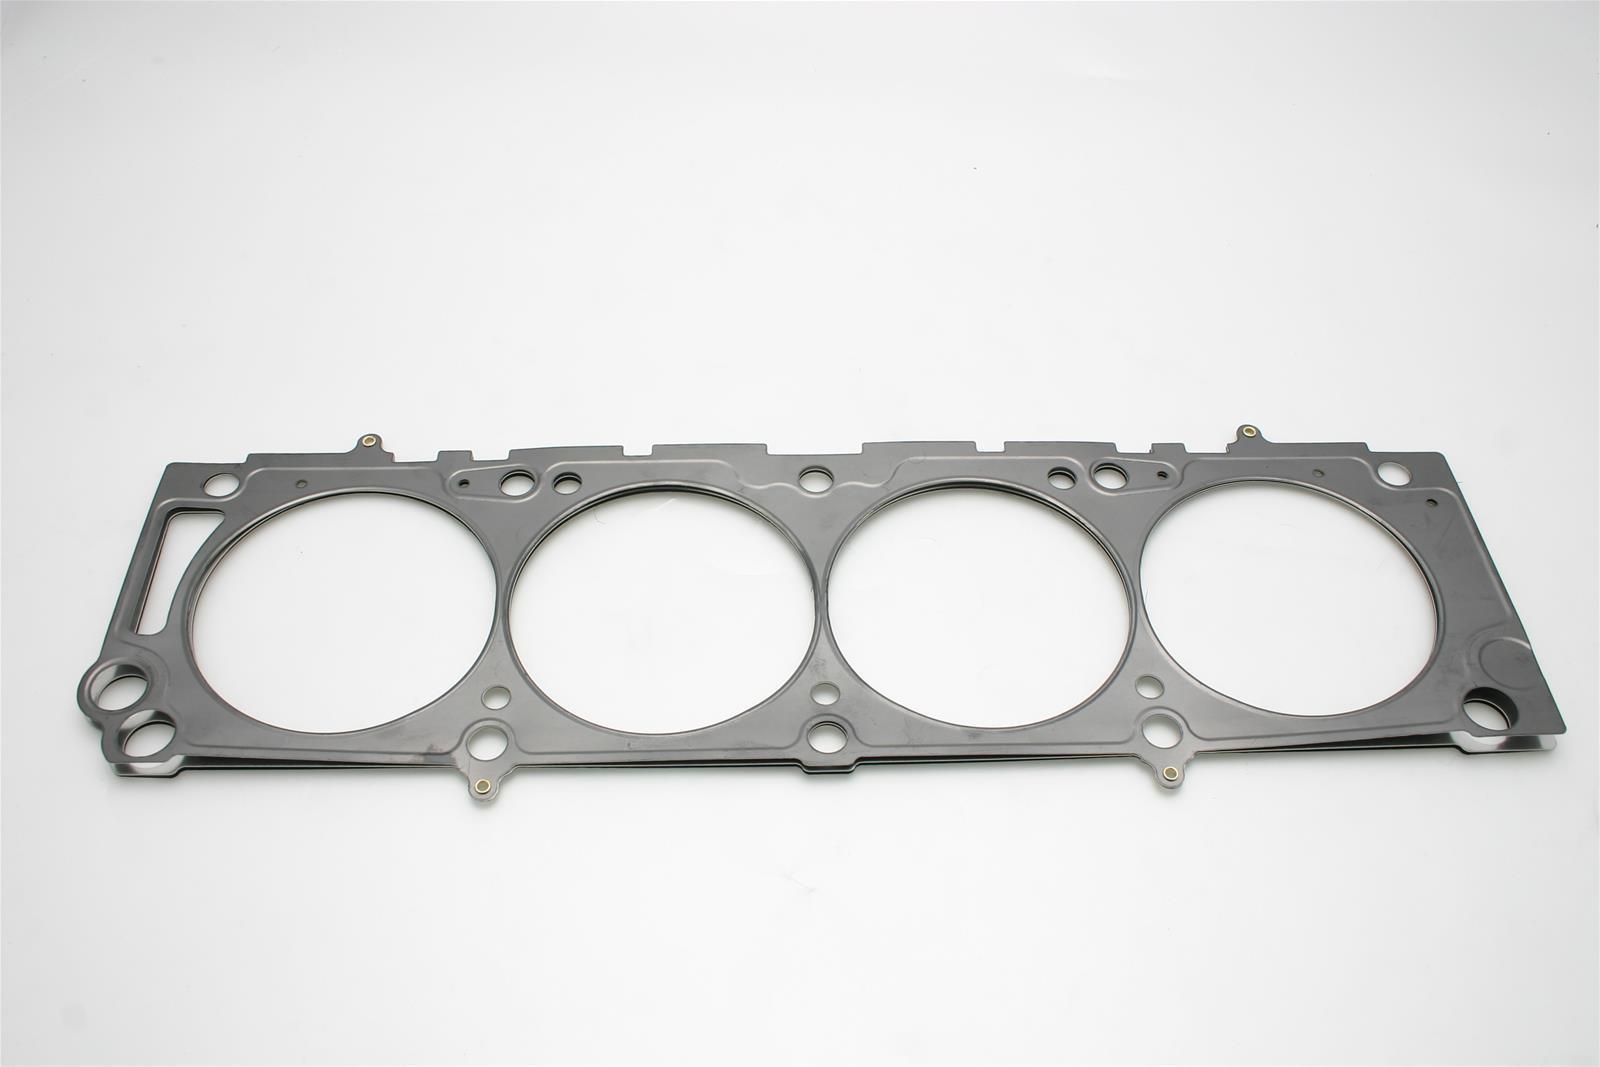 White Hose /& Stainless Gold Banjos Pro Braking PBF6008-WHT-GOL Front Braided Brake Line